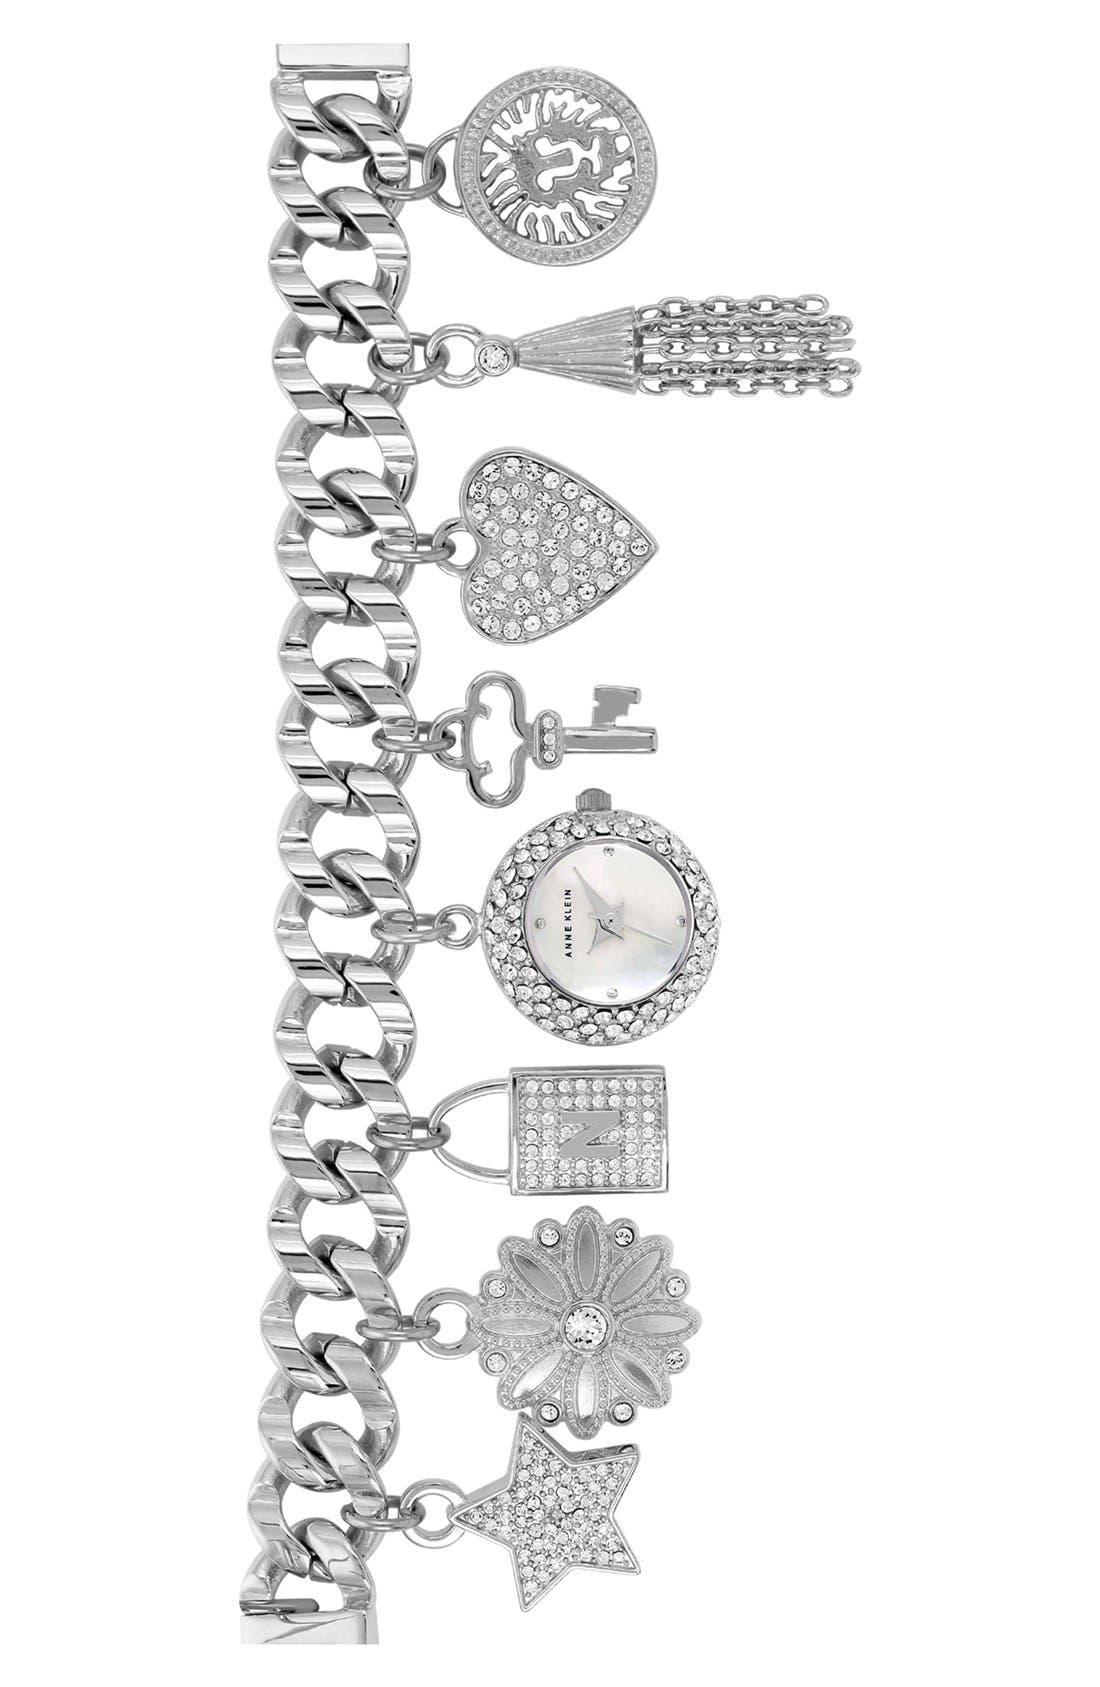 Alternate Image 1 Selected - Anne Klein Pavé Charm Bracelet Watch, 20mm (Nordstrom Exclusive)